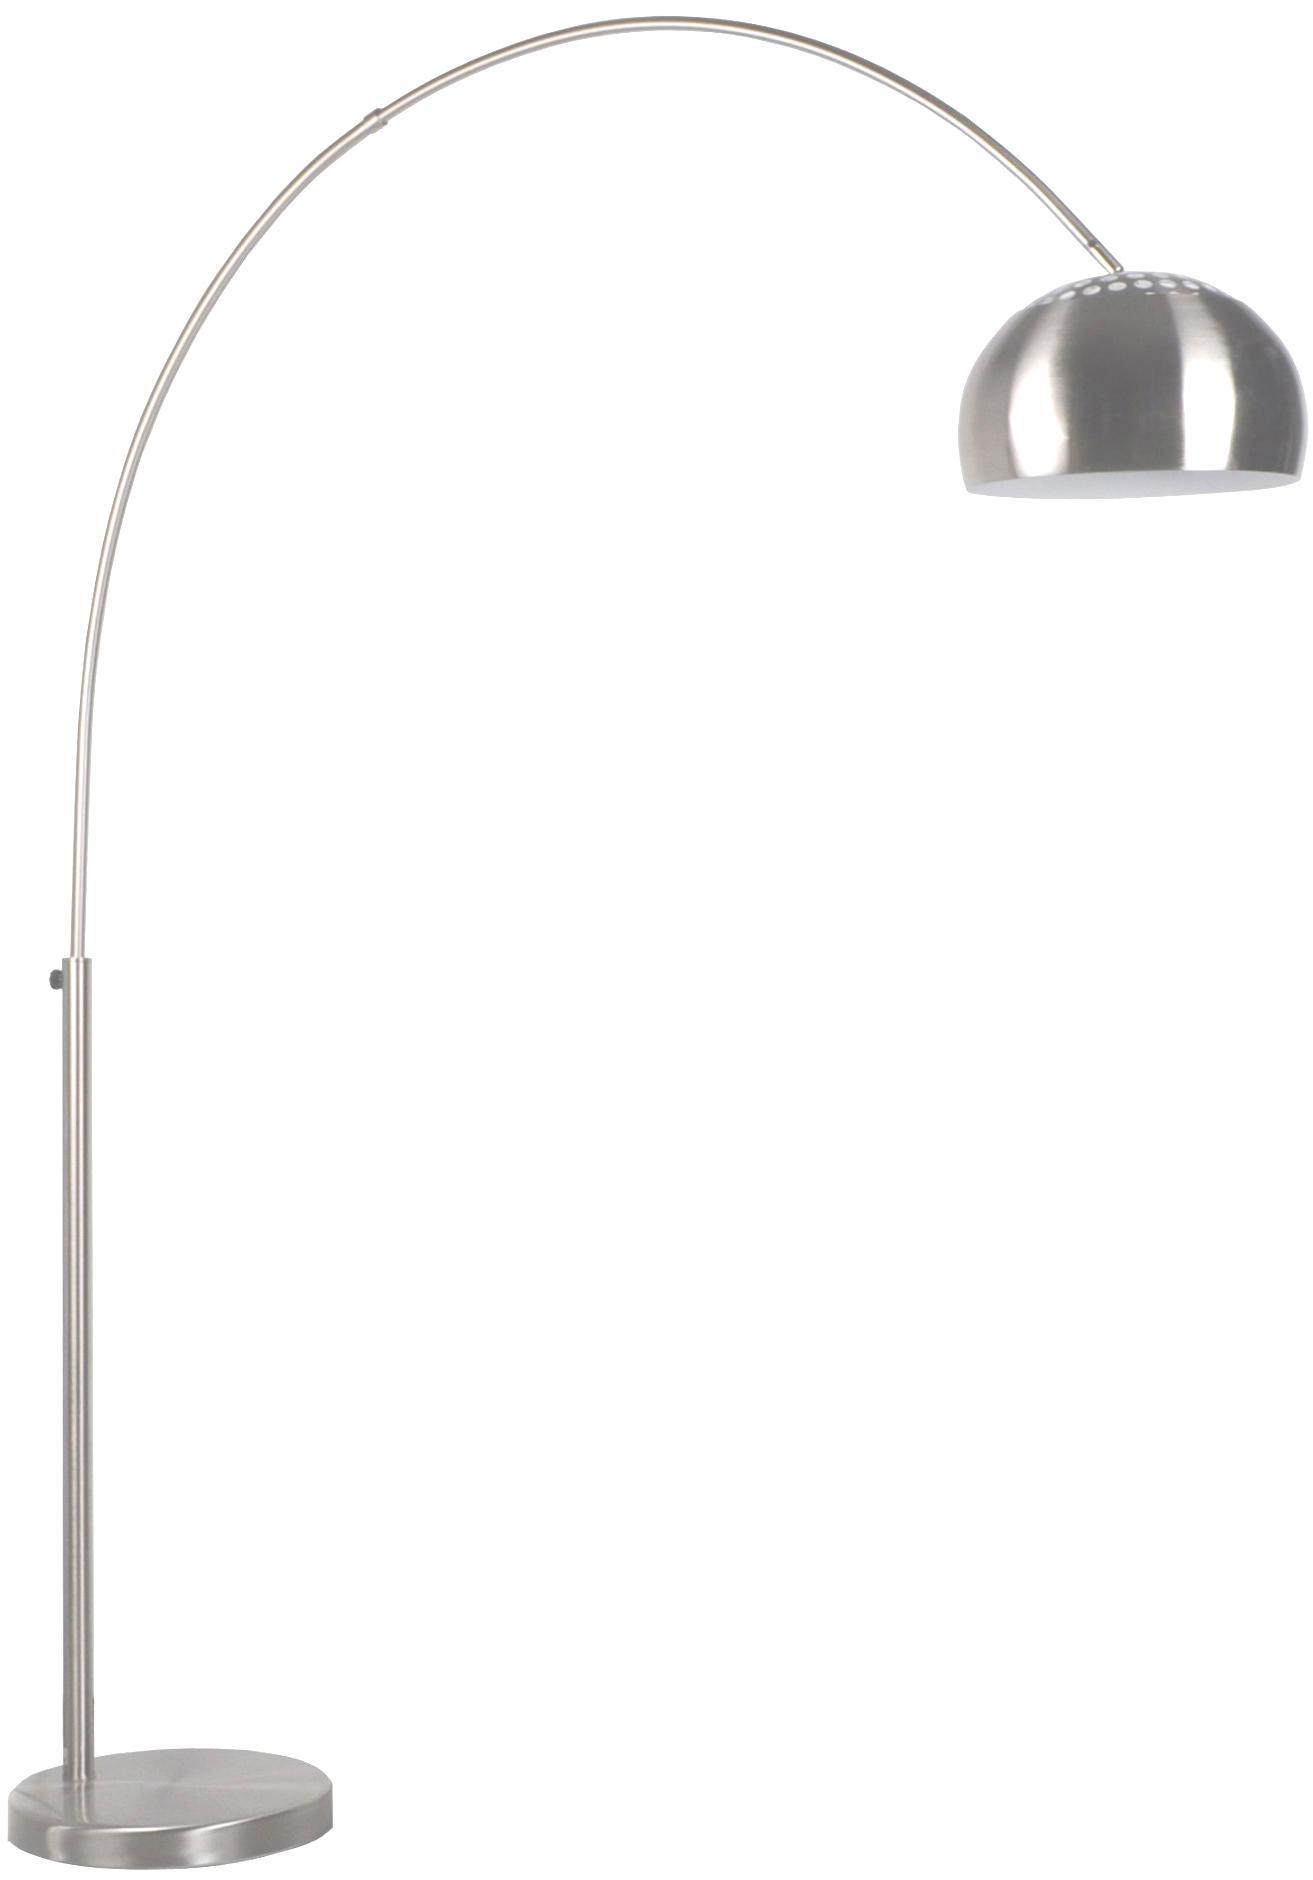 Bogenlampe Metal Bow in Silber, Lampenschirm: Metall, gebürstet, Gestell: Metall, gebürstet, Lampenfuß: Stein mit versilberter Me, Metall, 170 x 205 cm